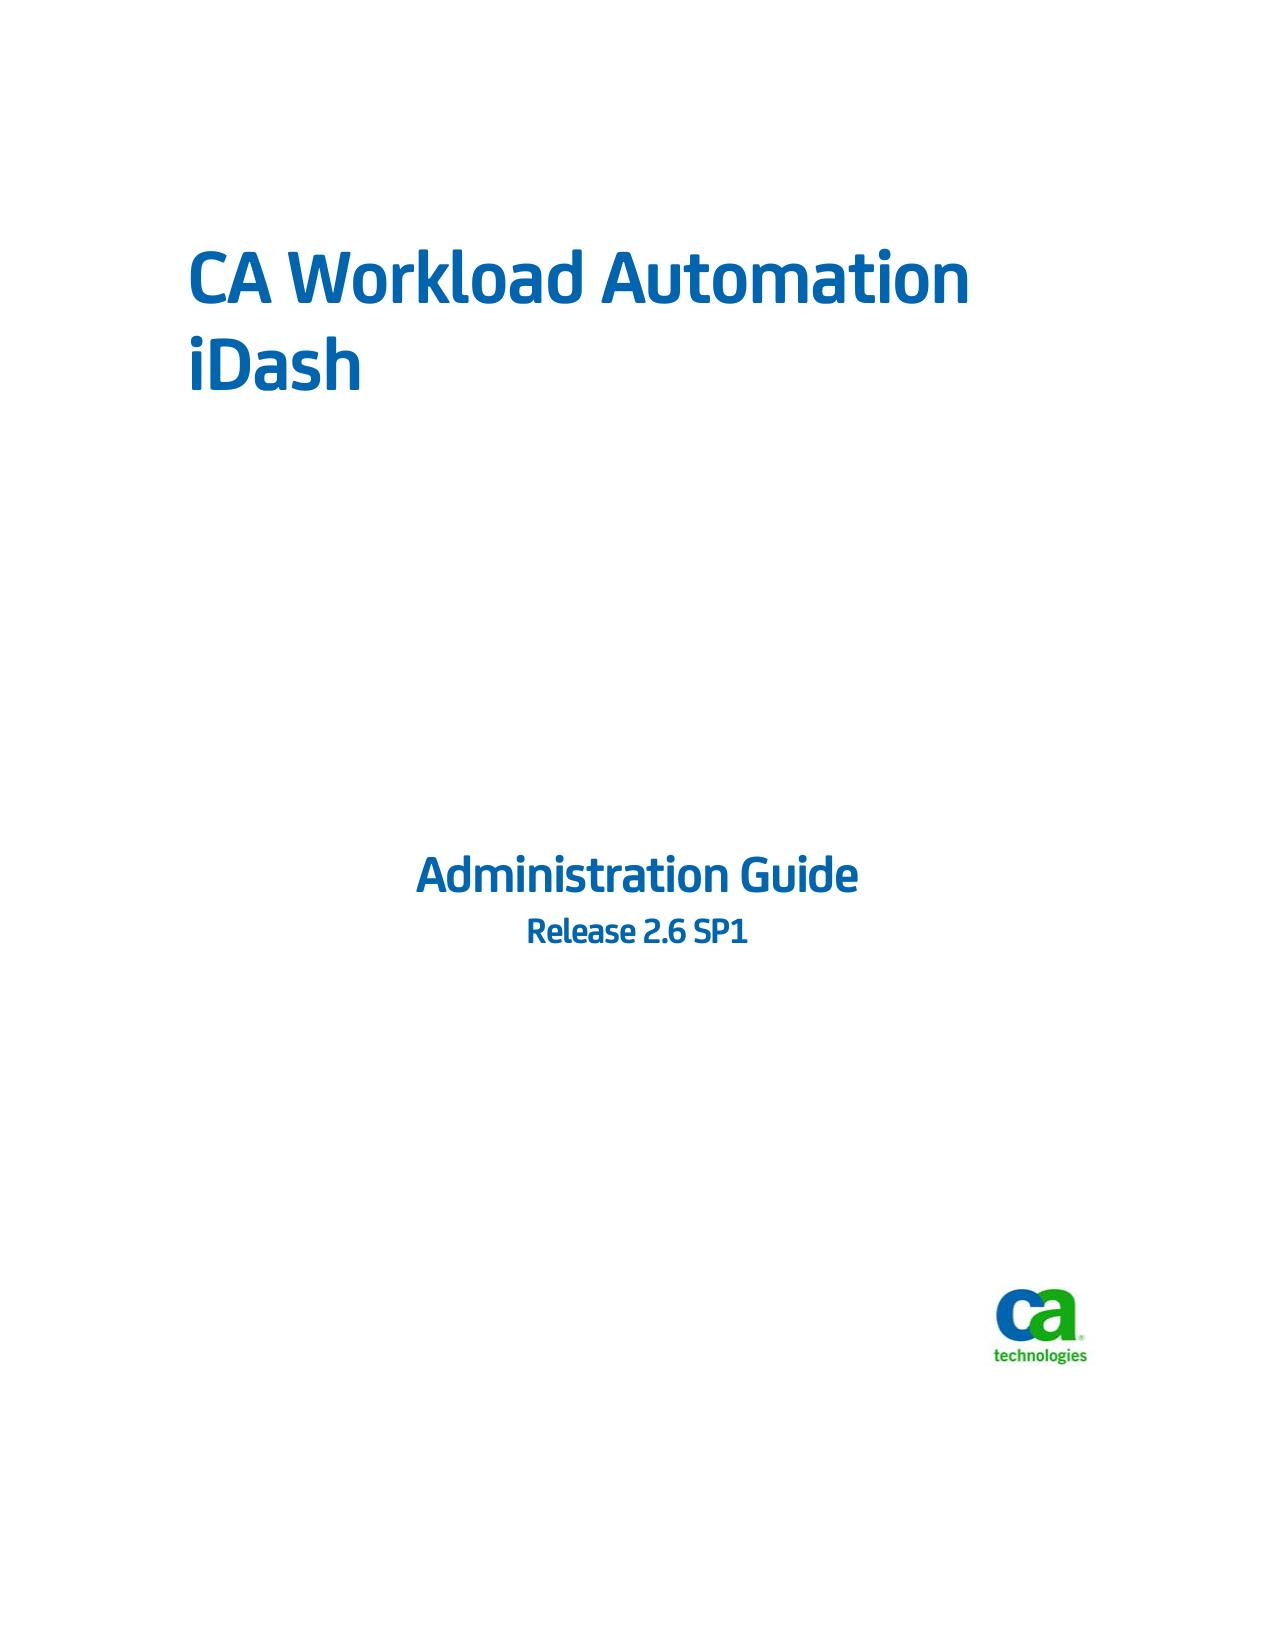 CA Workload Automation iDash Administration | manualzz com